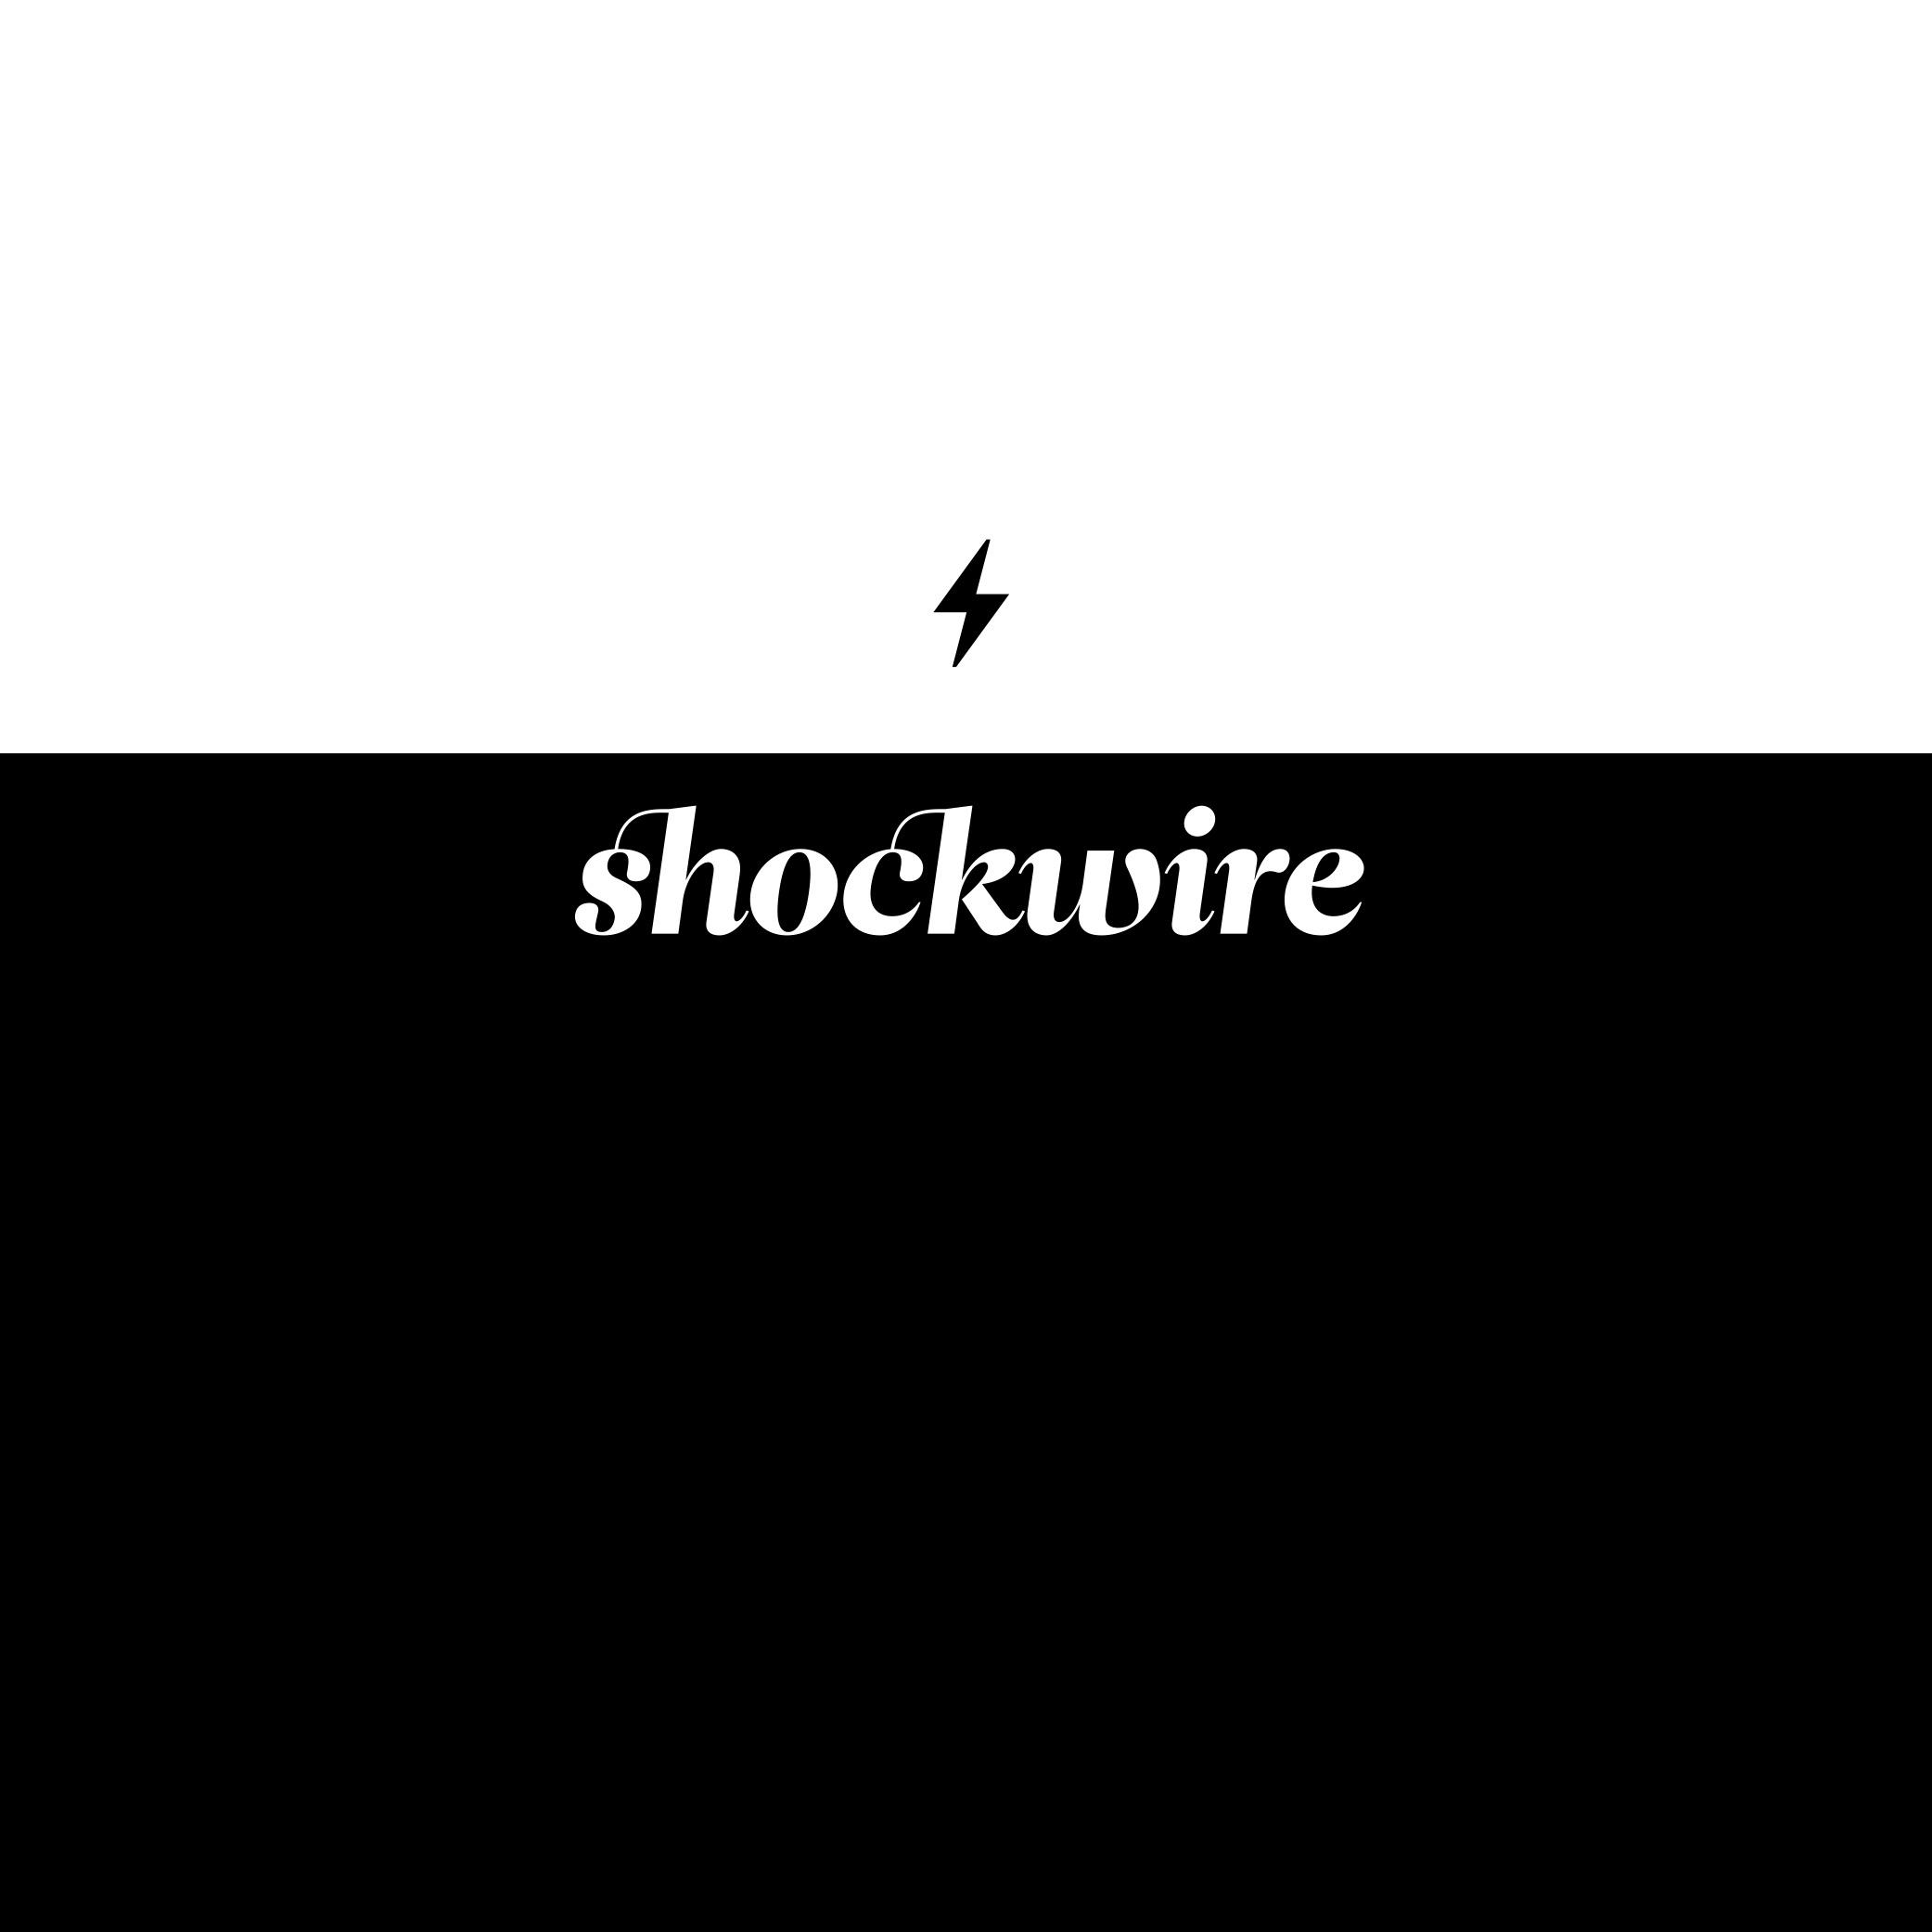 shockwire-logo-fullwordmark.jpg